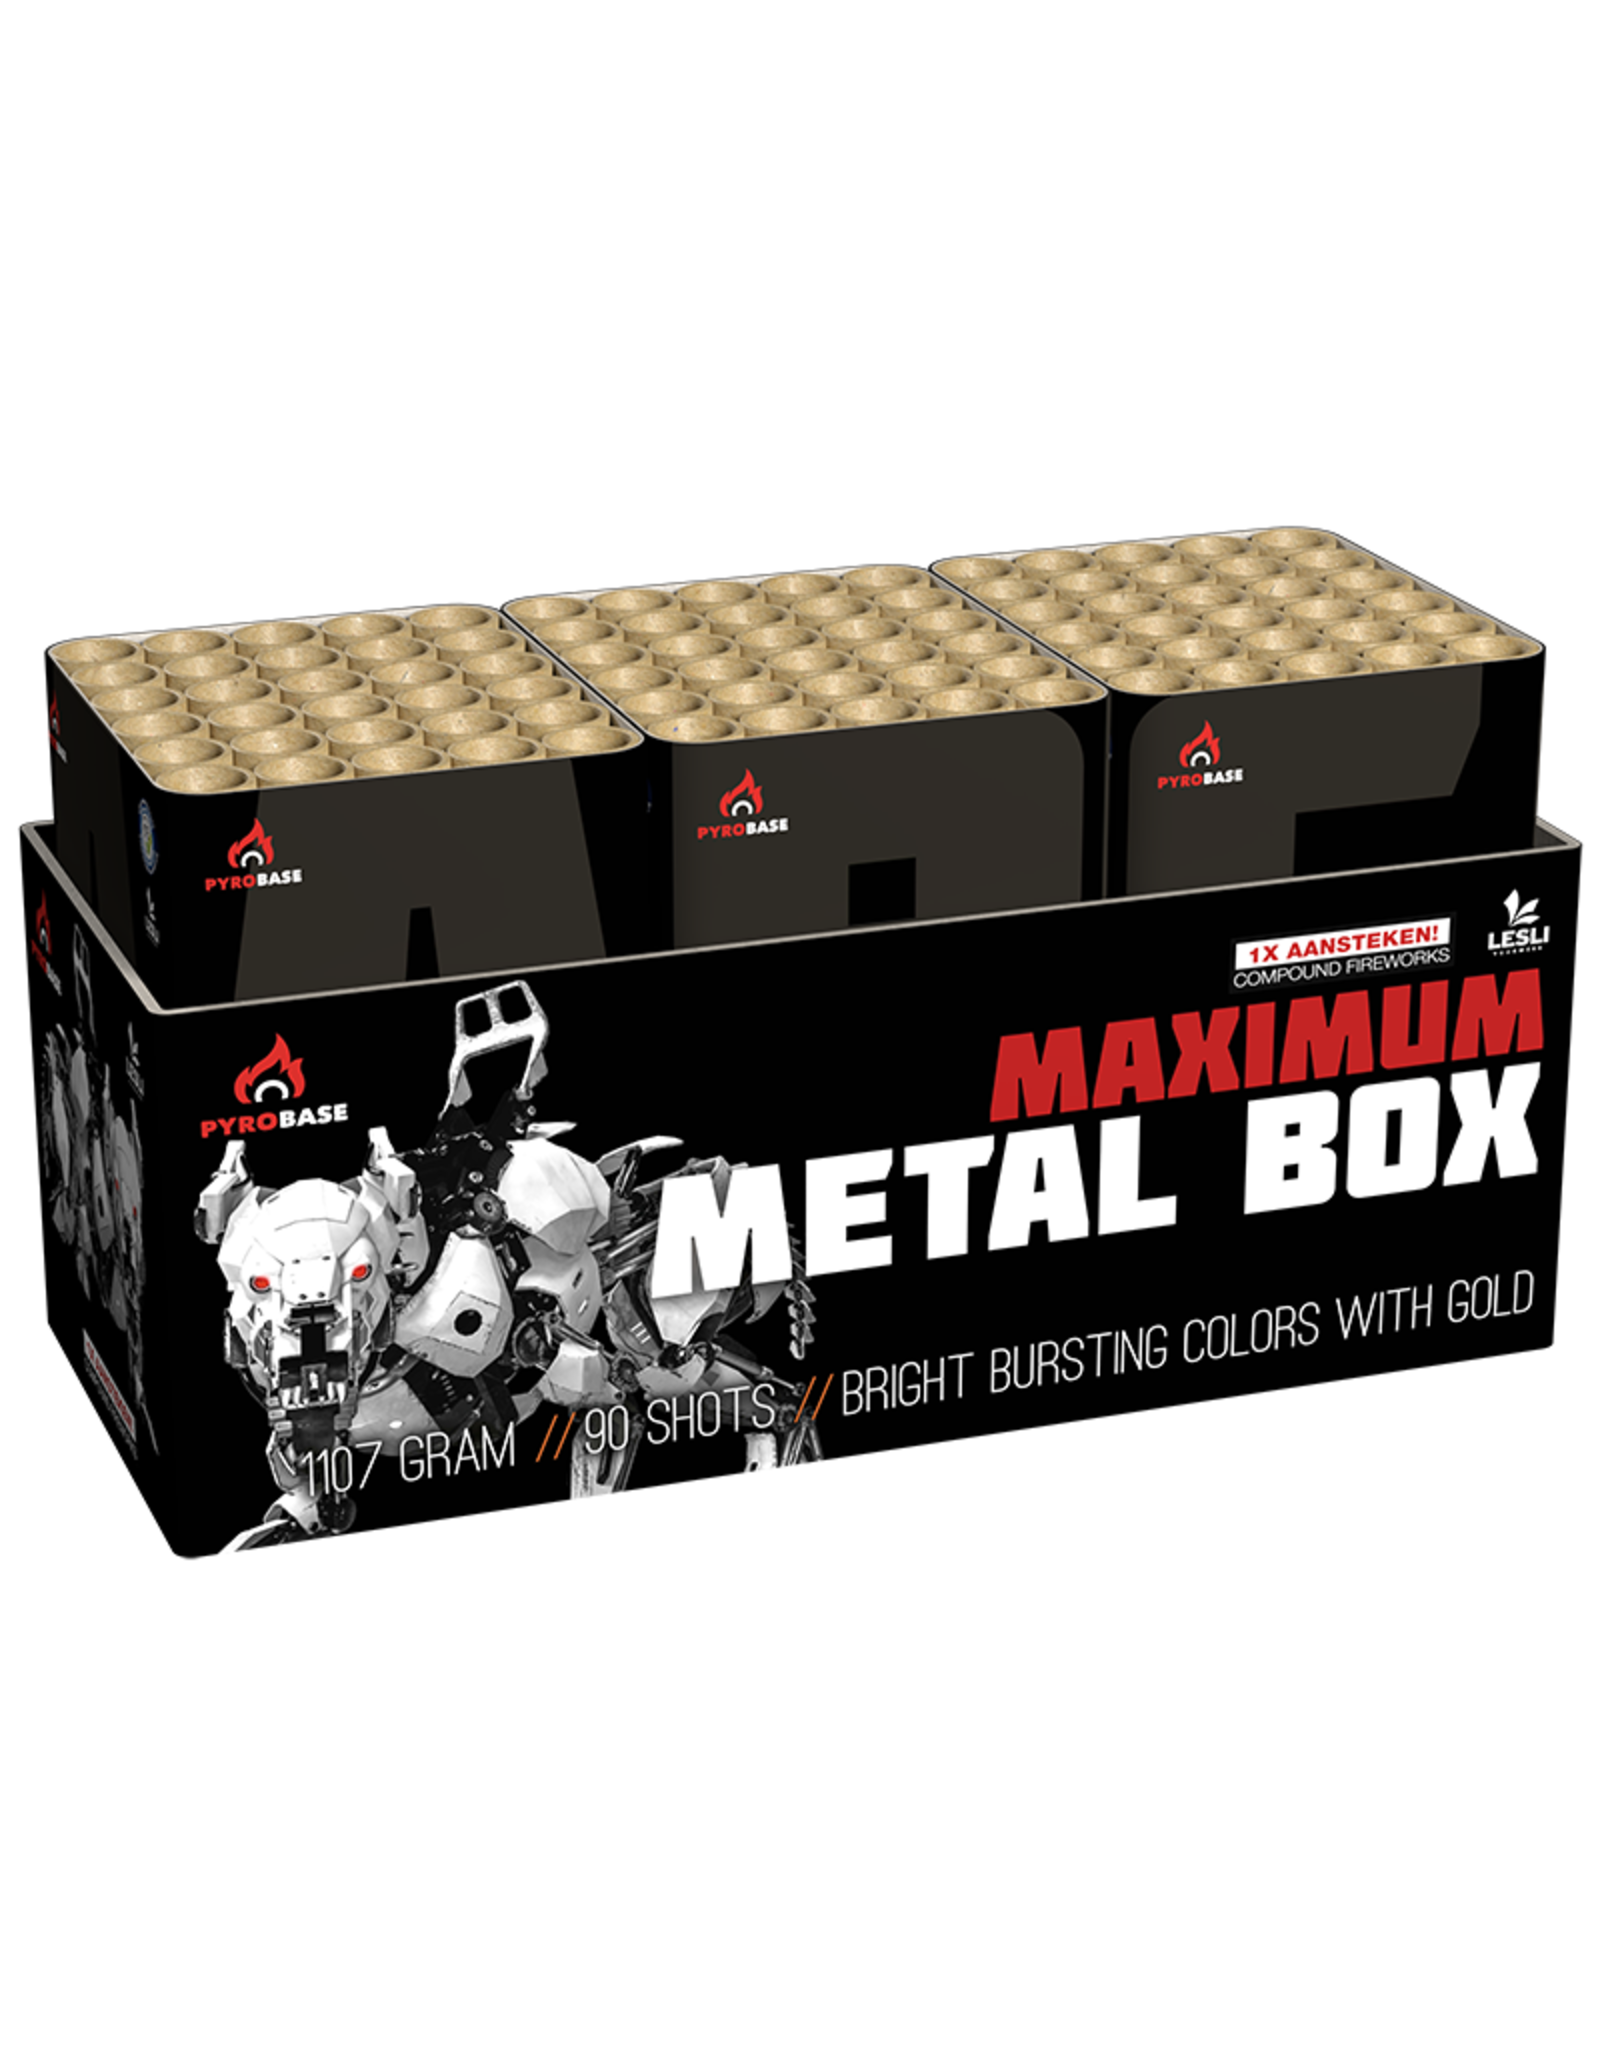 Lesli Vuurwerk Maximum Metal Box 90 shots